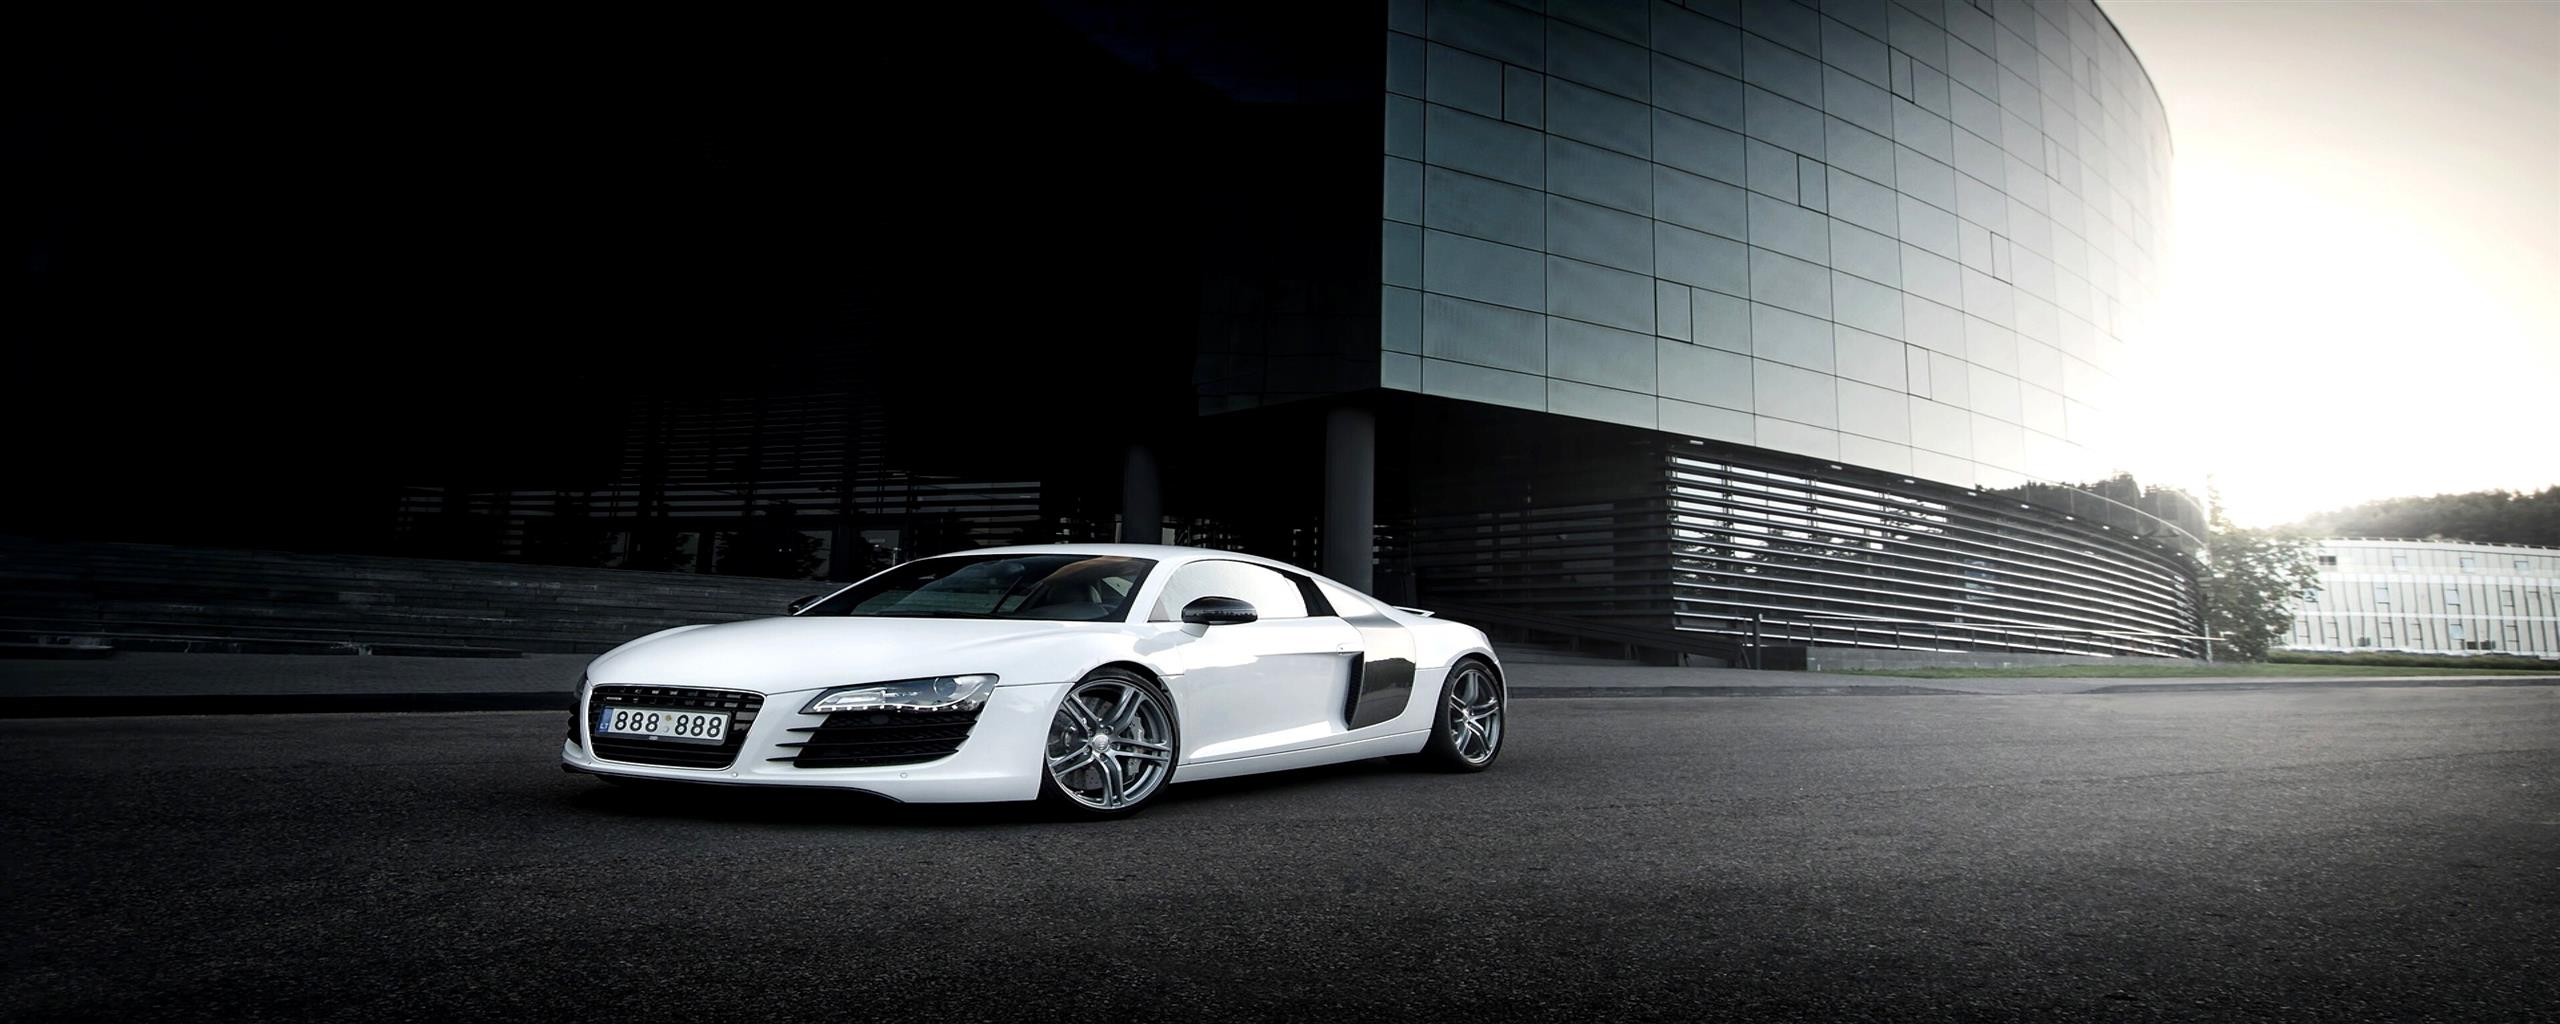 2560x1024 White Audi R8 Background Wallpaper